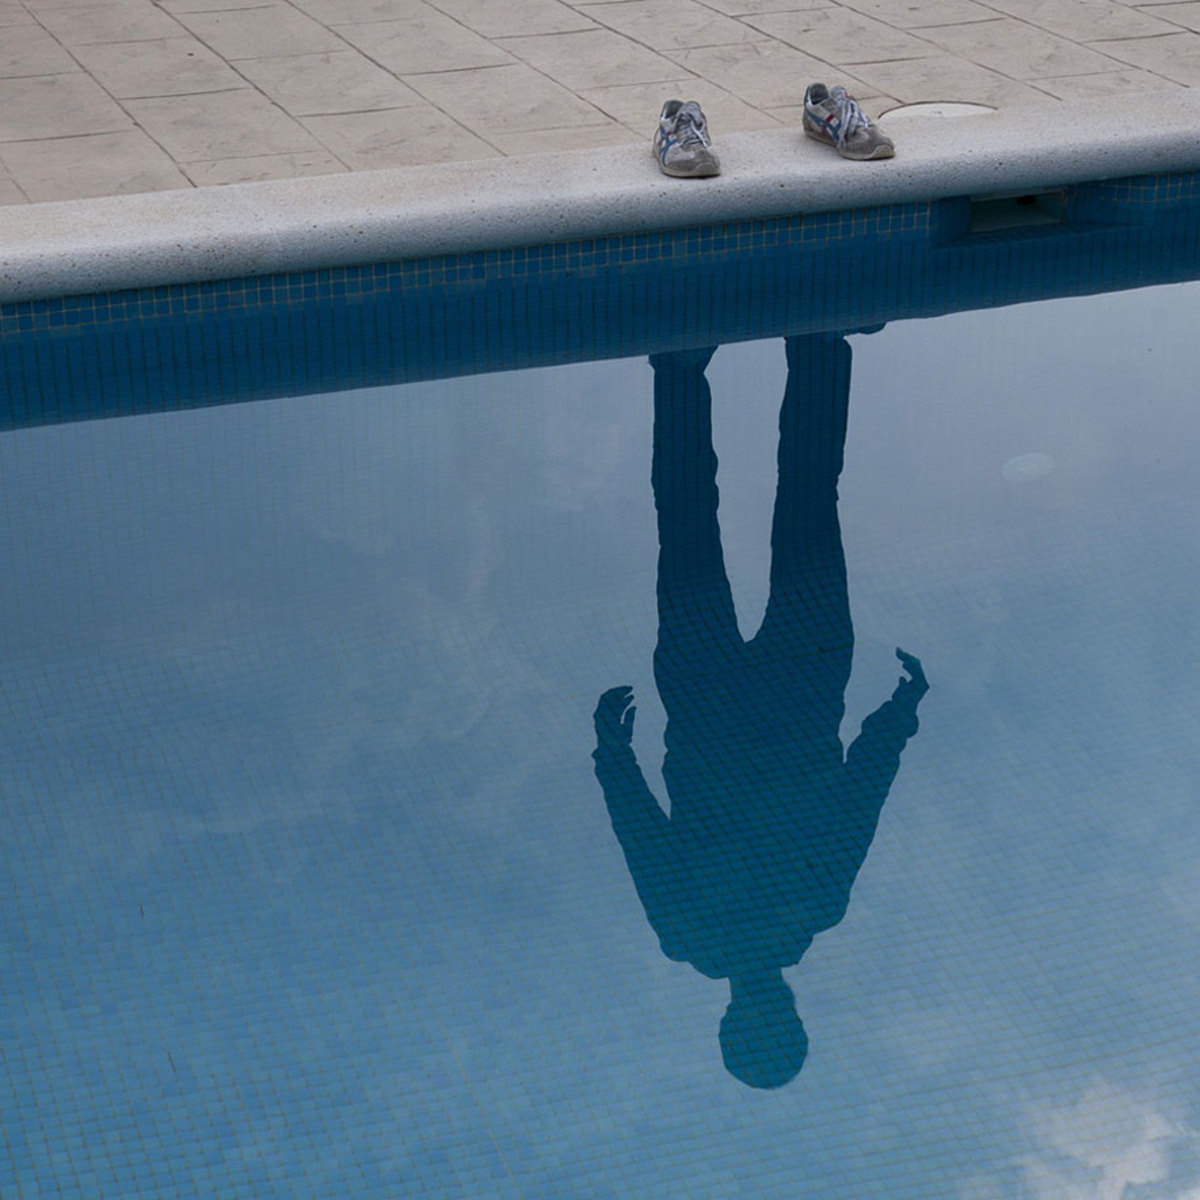 invisible-man-shadows-pol-ubeda-1